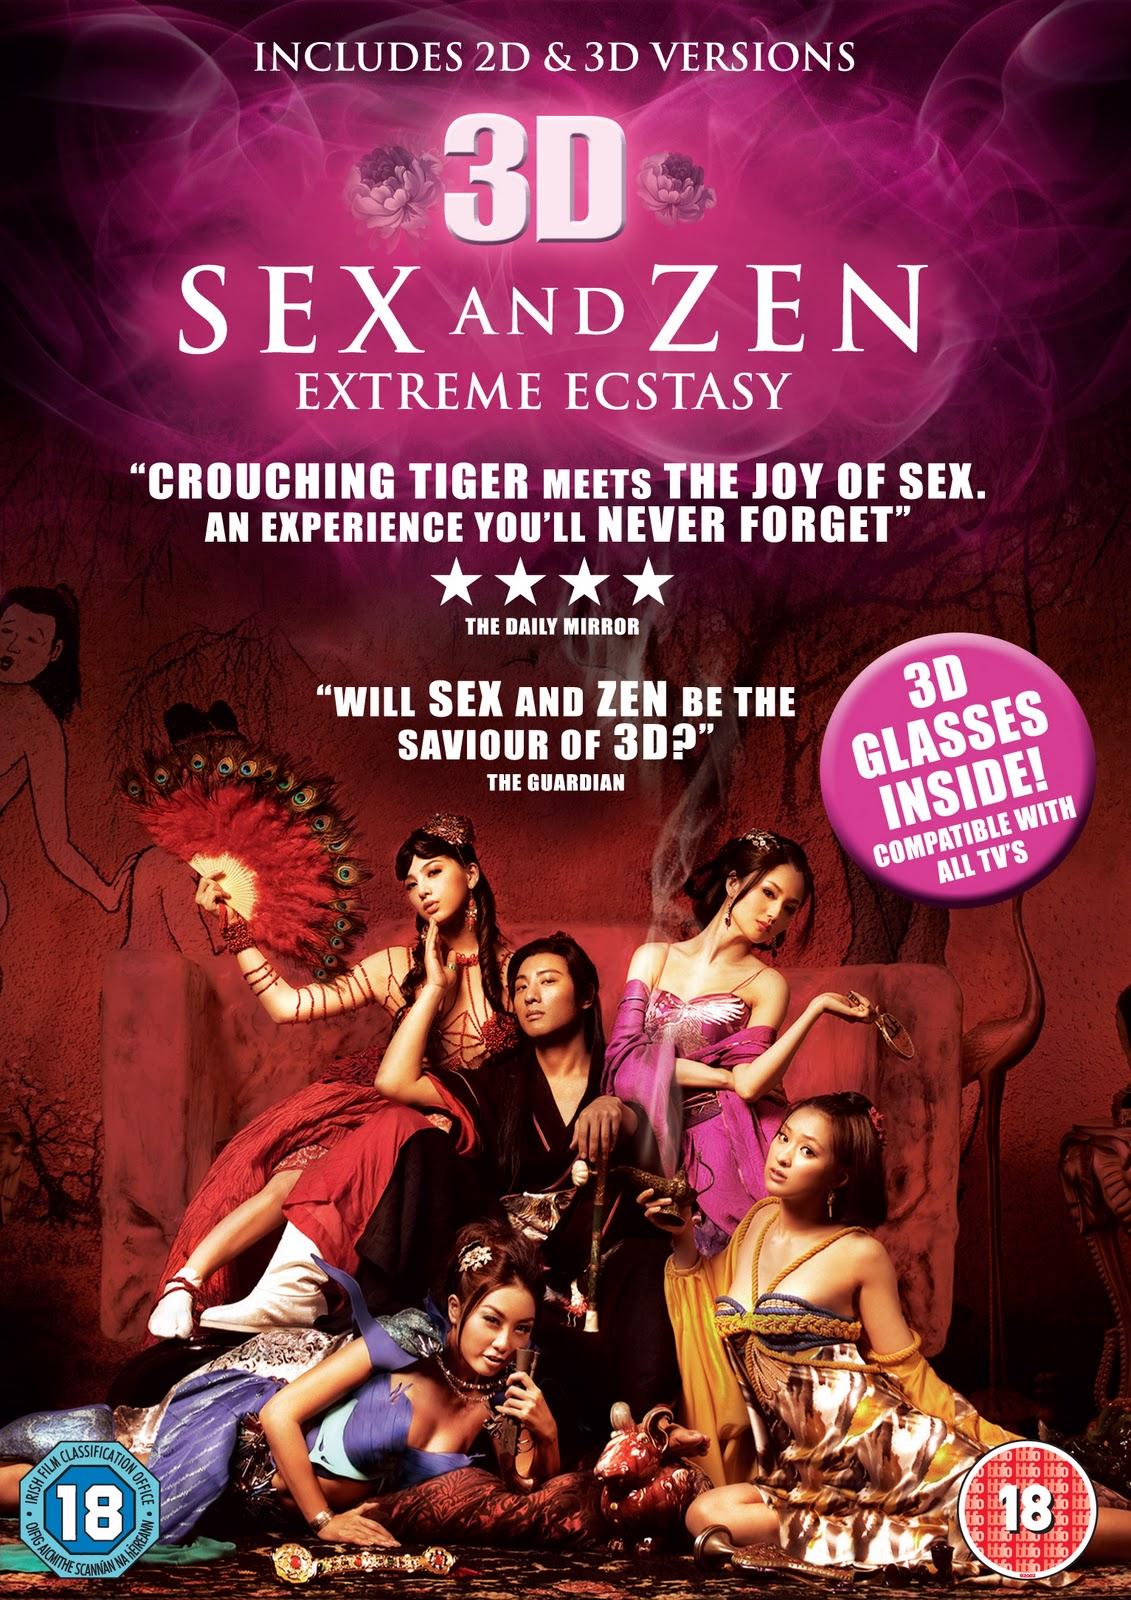 World's 1st 3D porn movie 'Sex and Zen' premieres